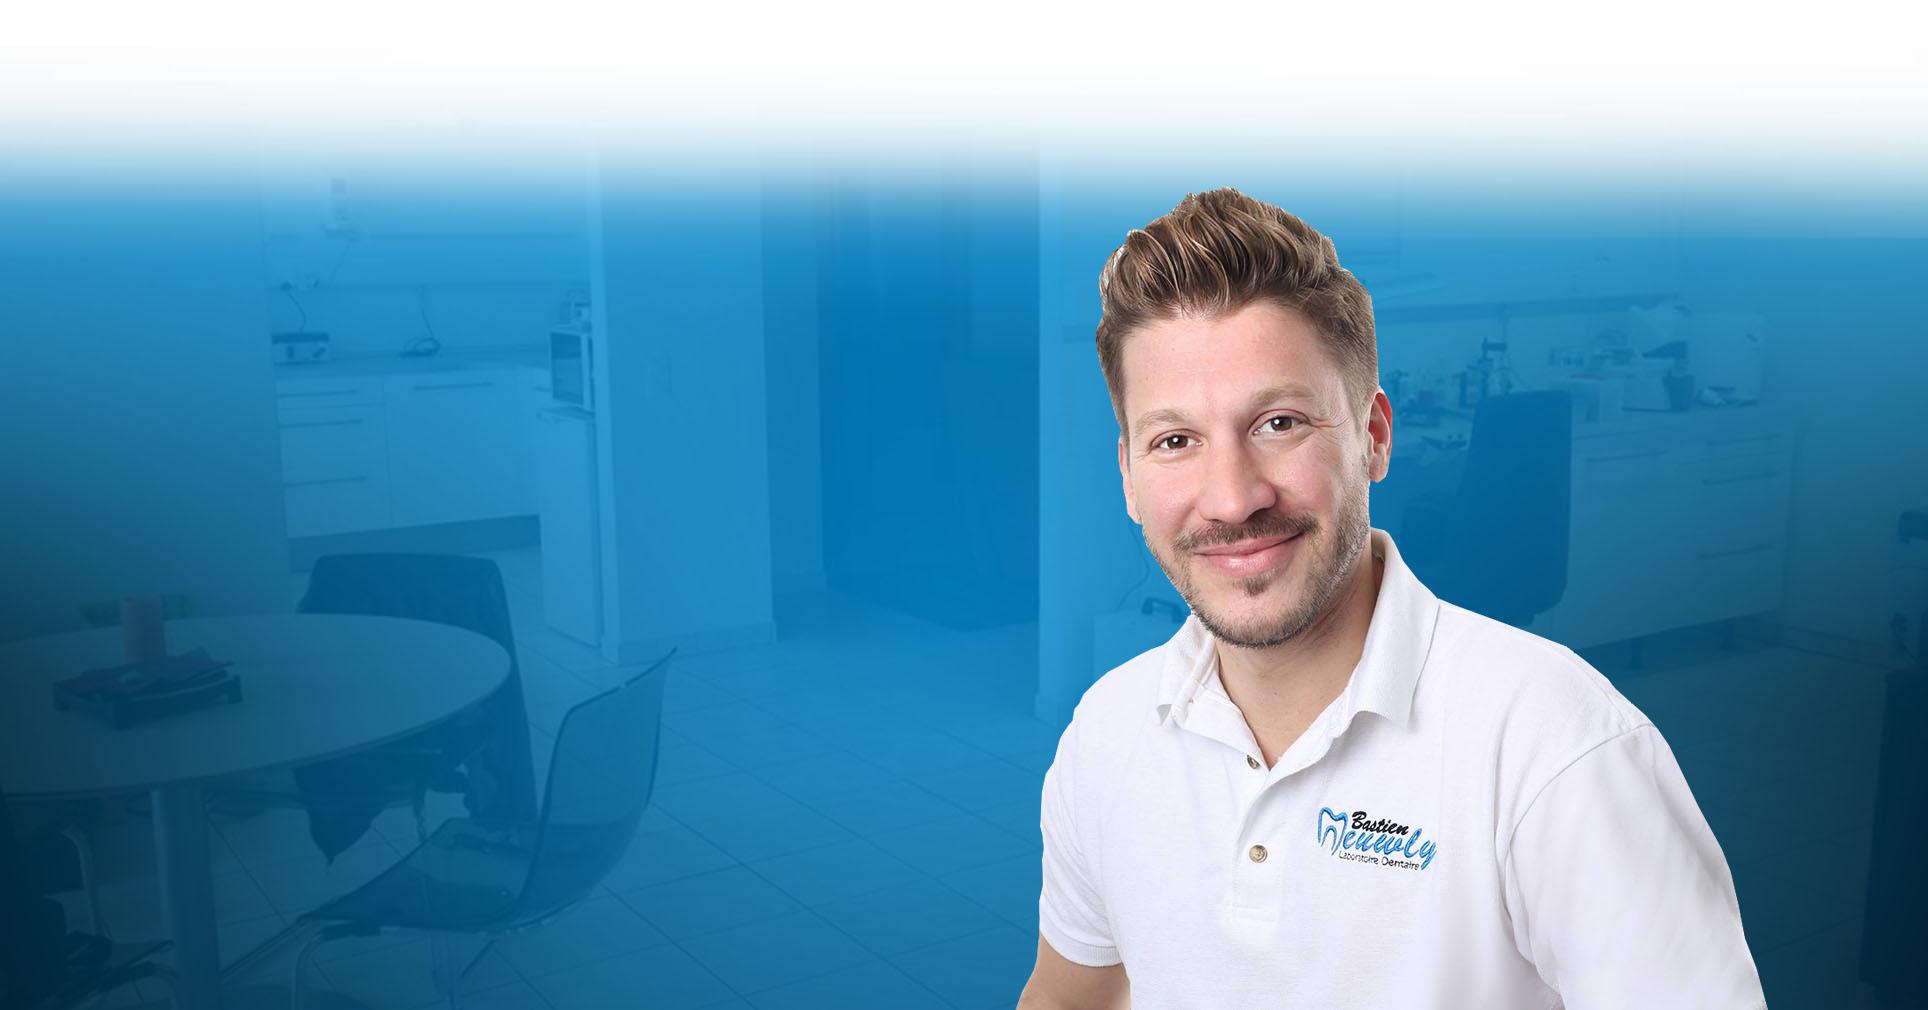 Laboratoire Meuwly - votre laboratoire dentaire